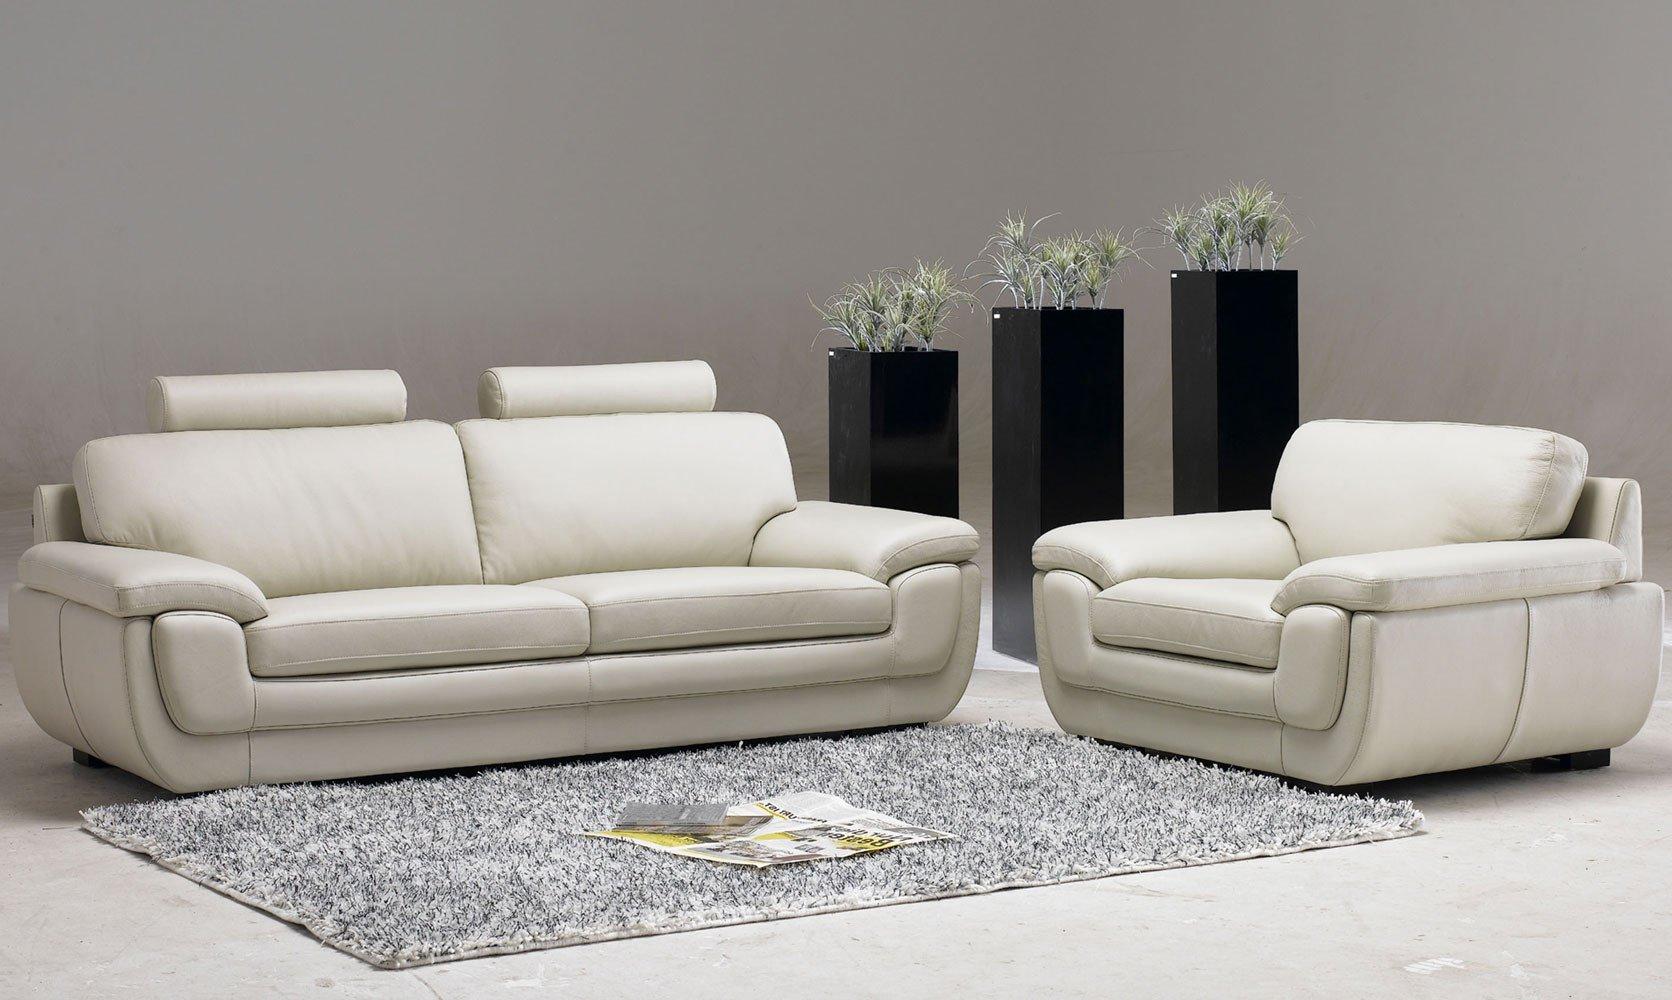 Comfortable Chairs Living Room Inspirational Criterion Of fortable Chairs for Living Room